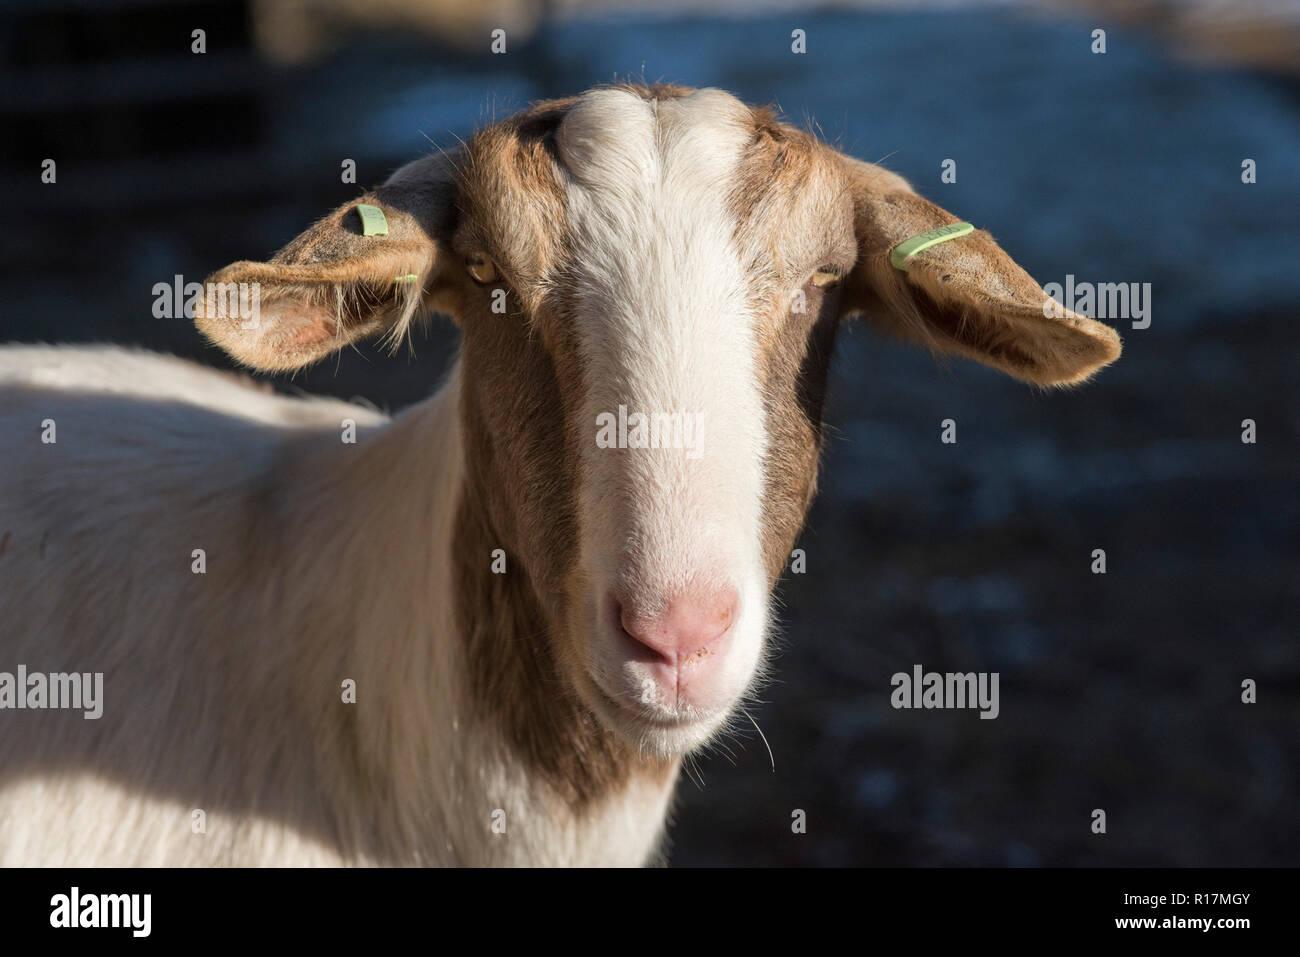 Boer cross nanny goat with ear tags, progeny of milking goats kept at a pet, Berkshire, February - Stock Image